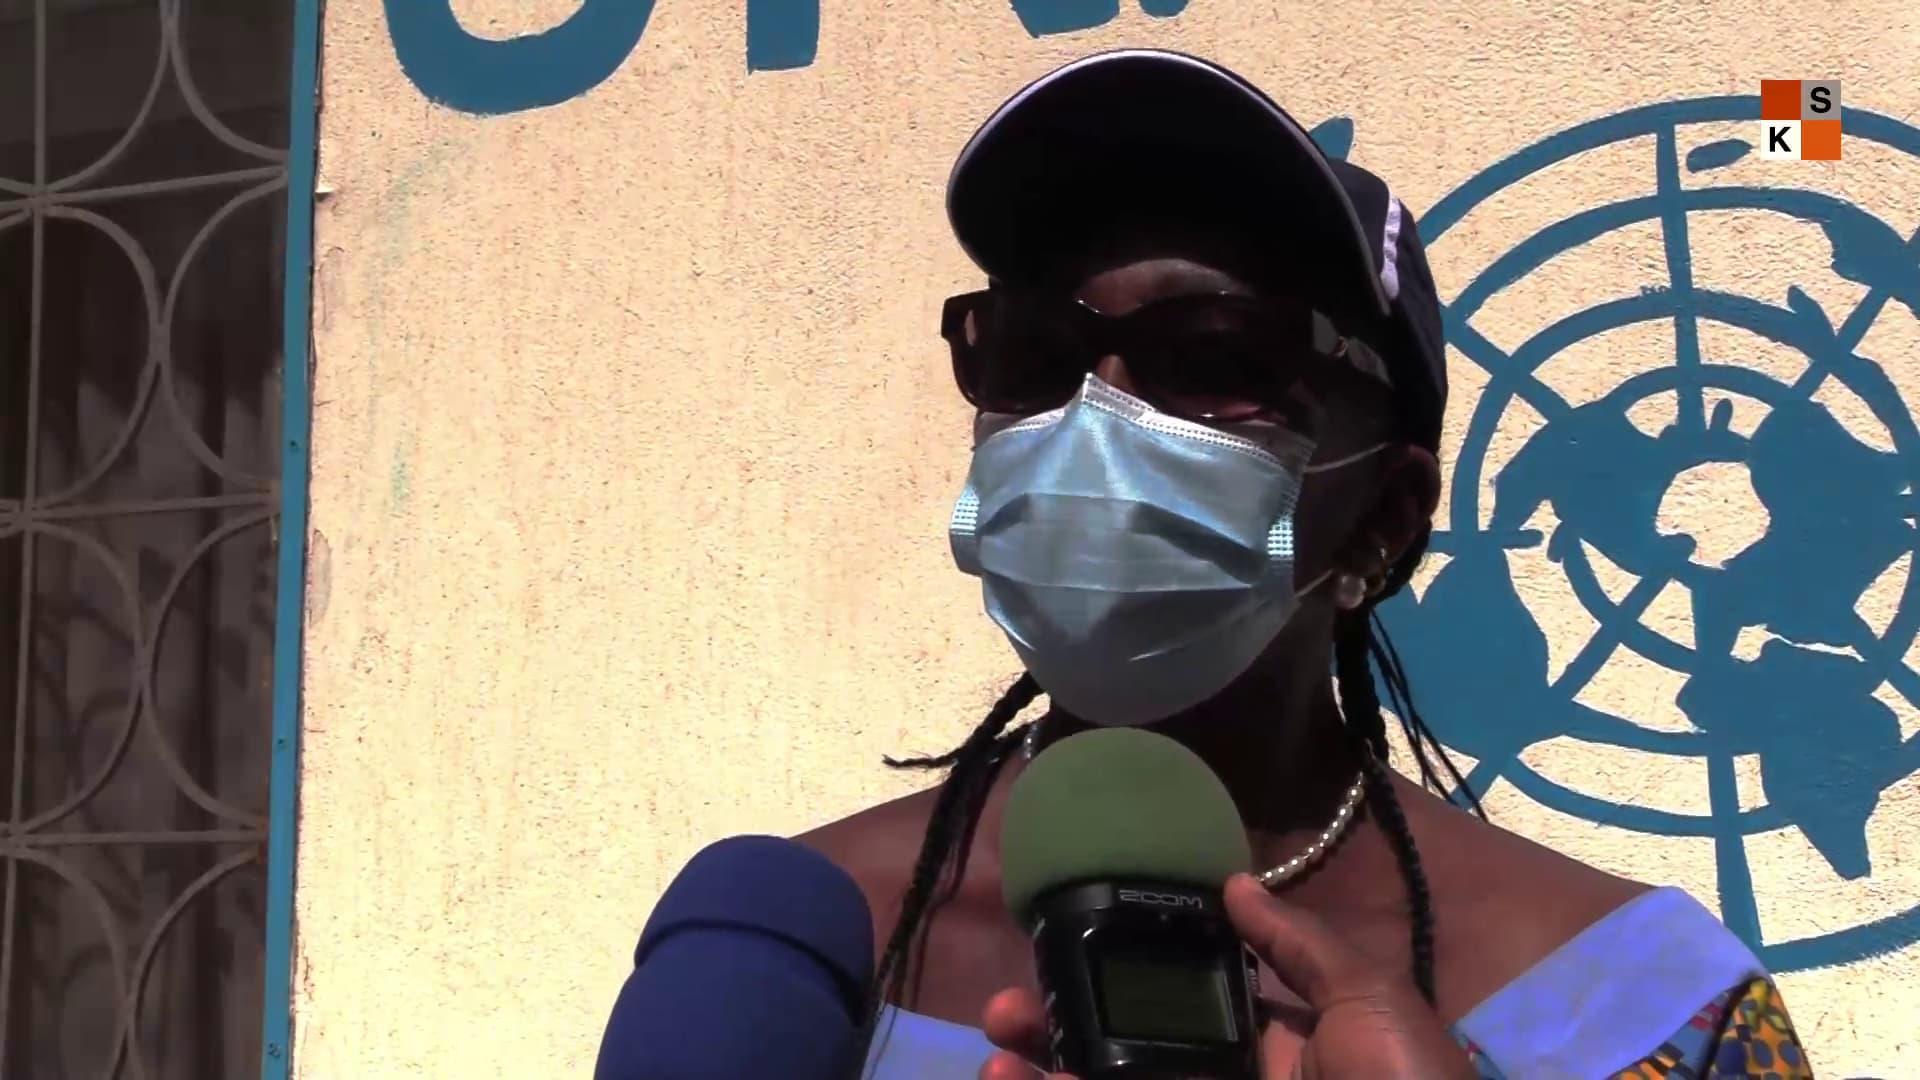 La représentante de l'OMS au Niger explique les vaccins contre le covid-19